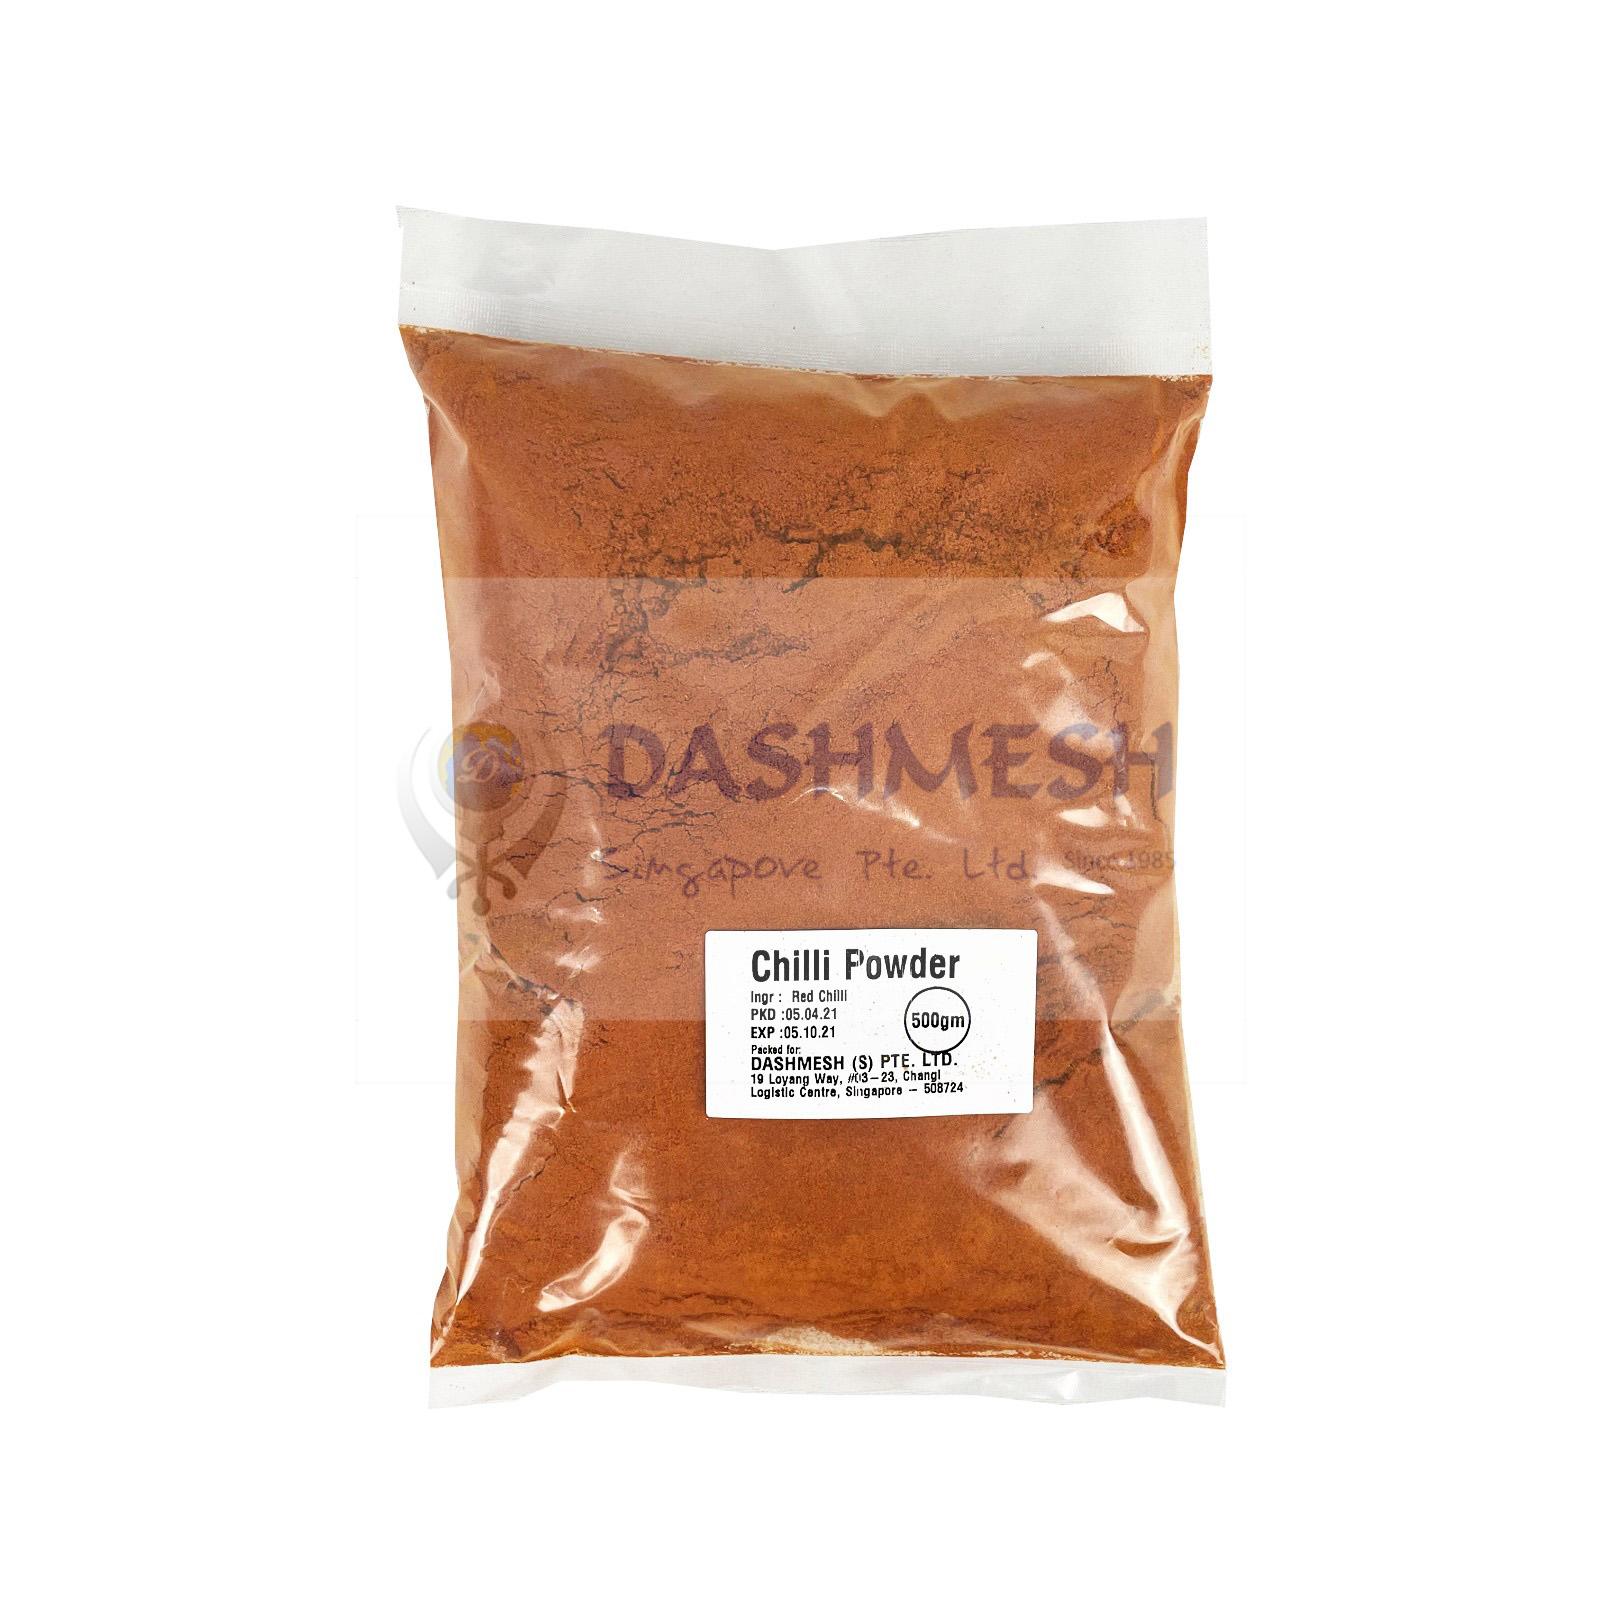 Chilli Powder (A Grade) 500g & 5kg